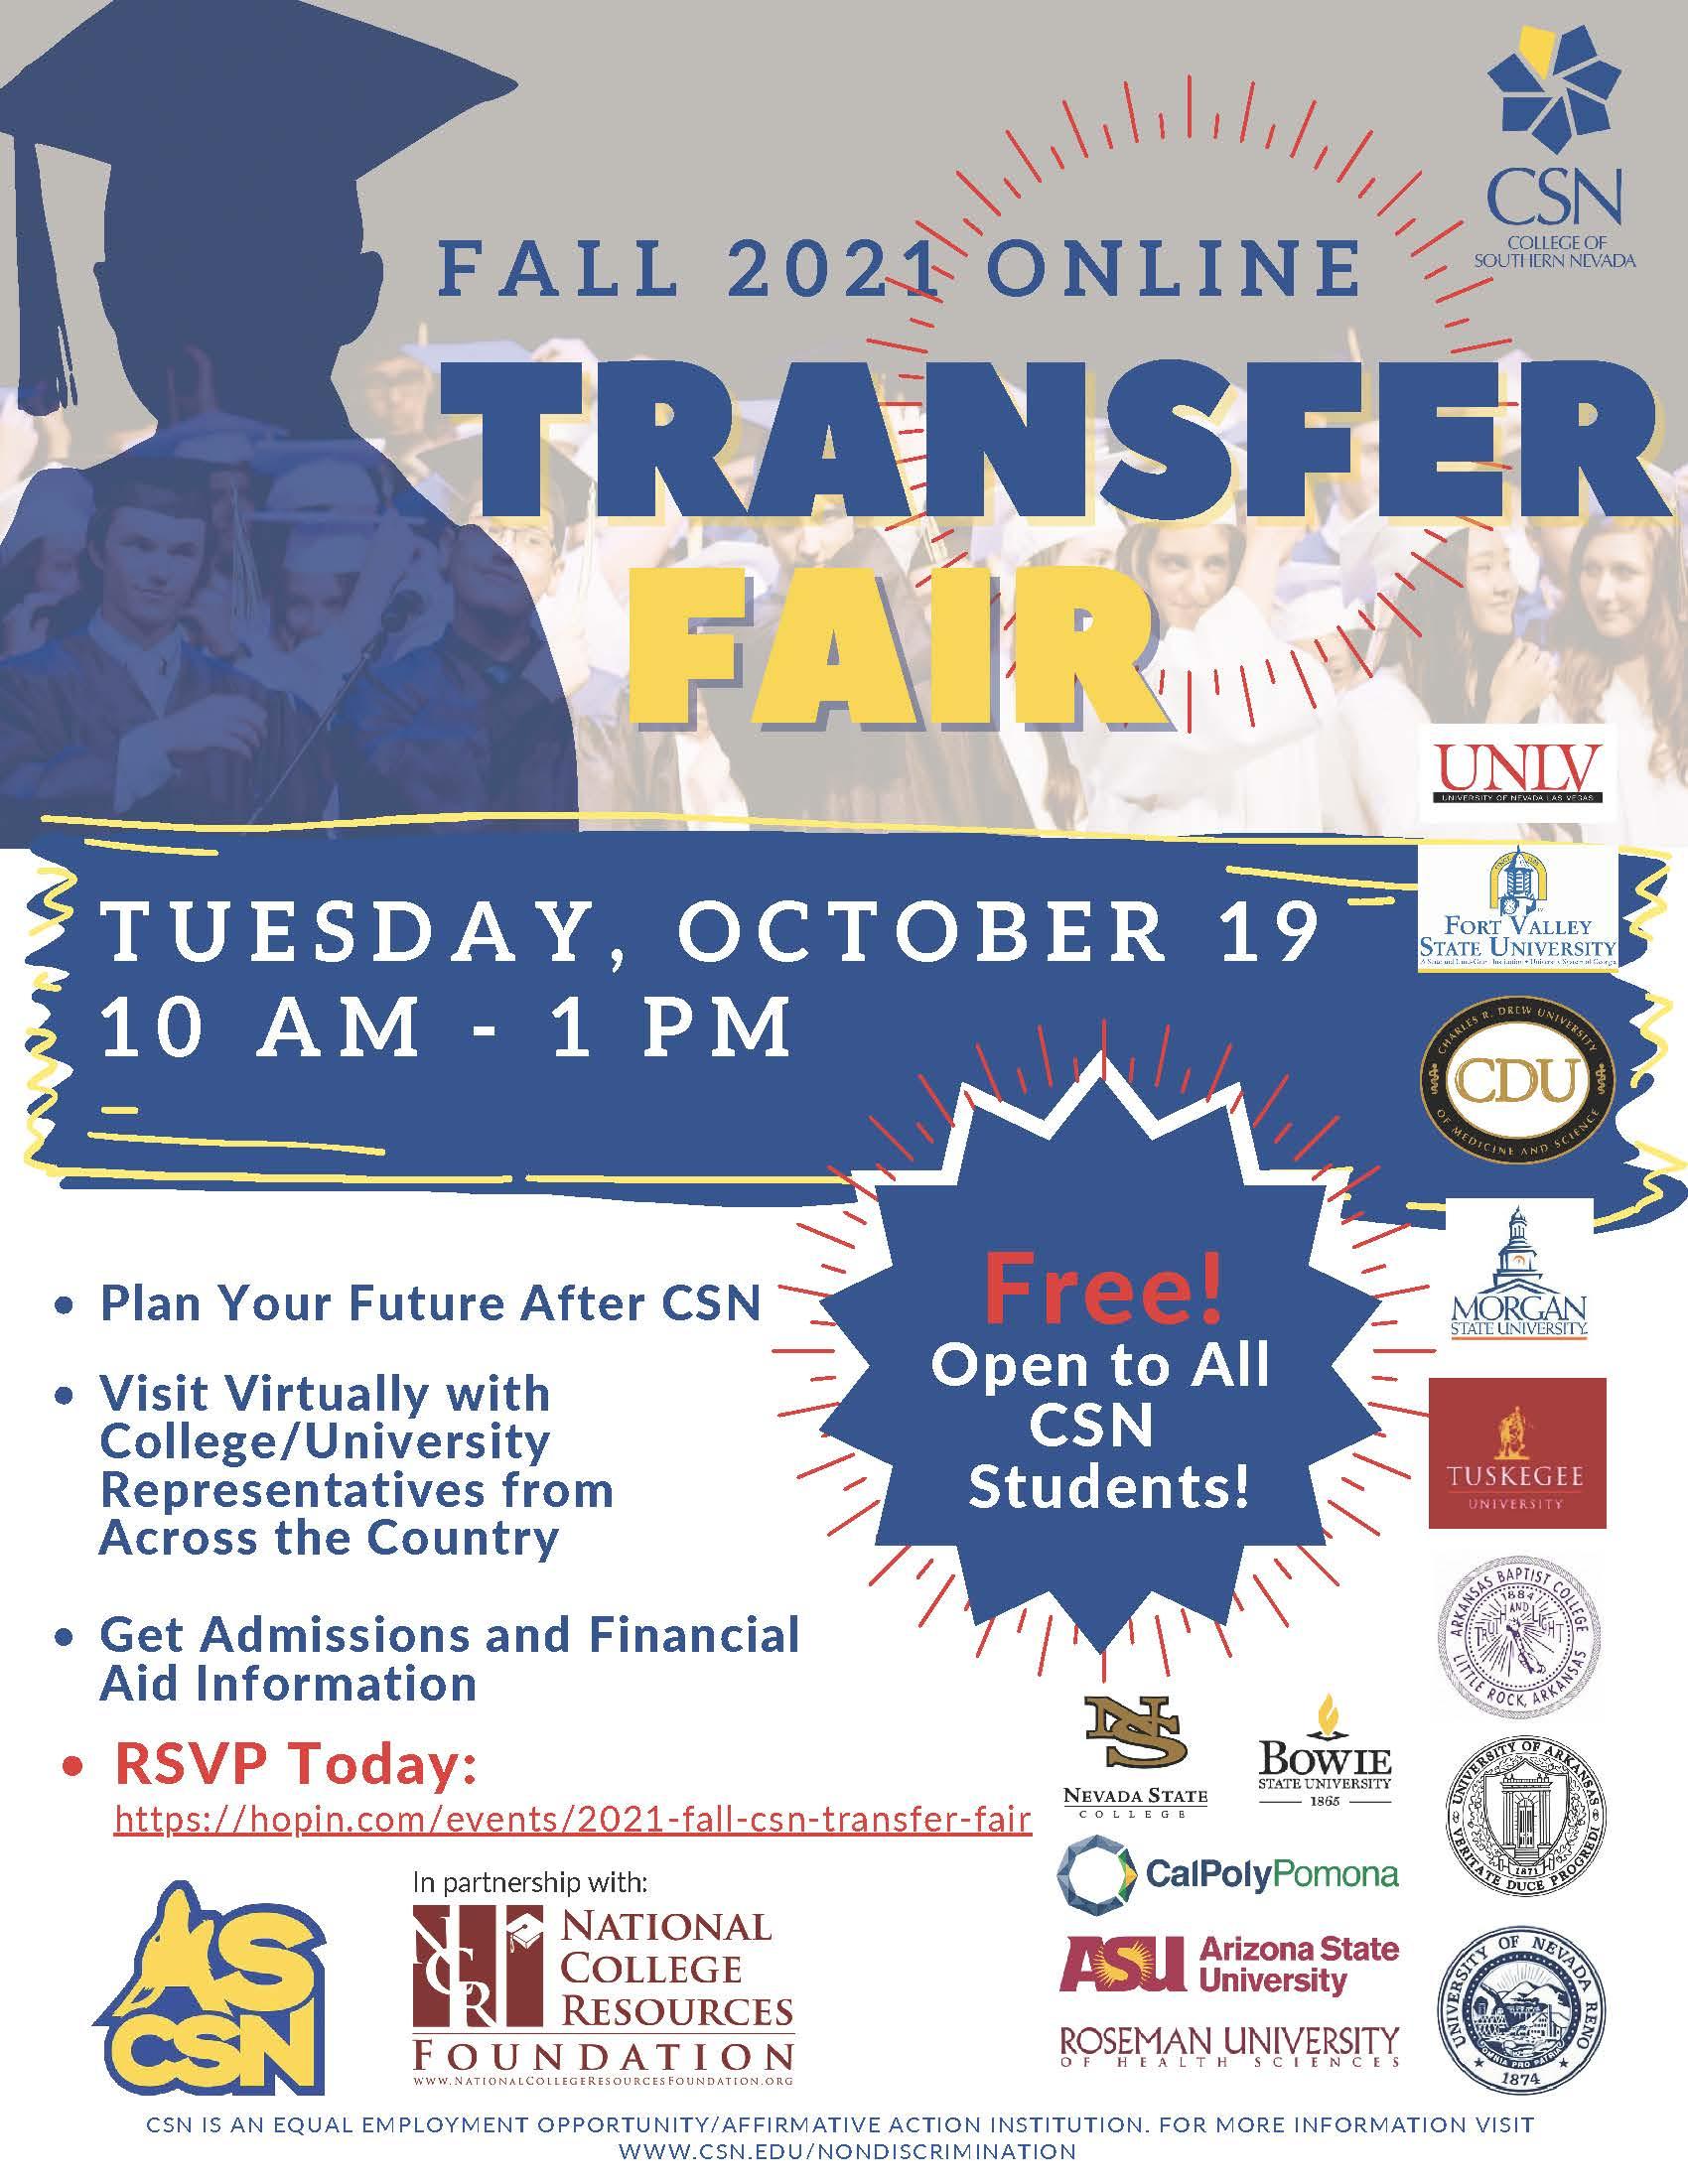 Fall 2021 Online Transfer Fair